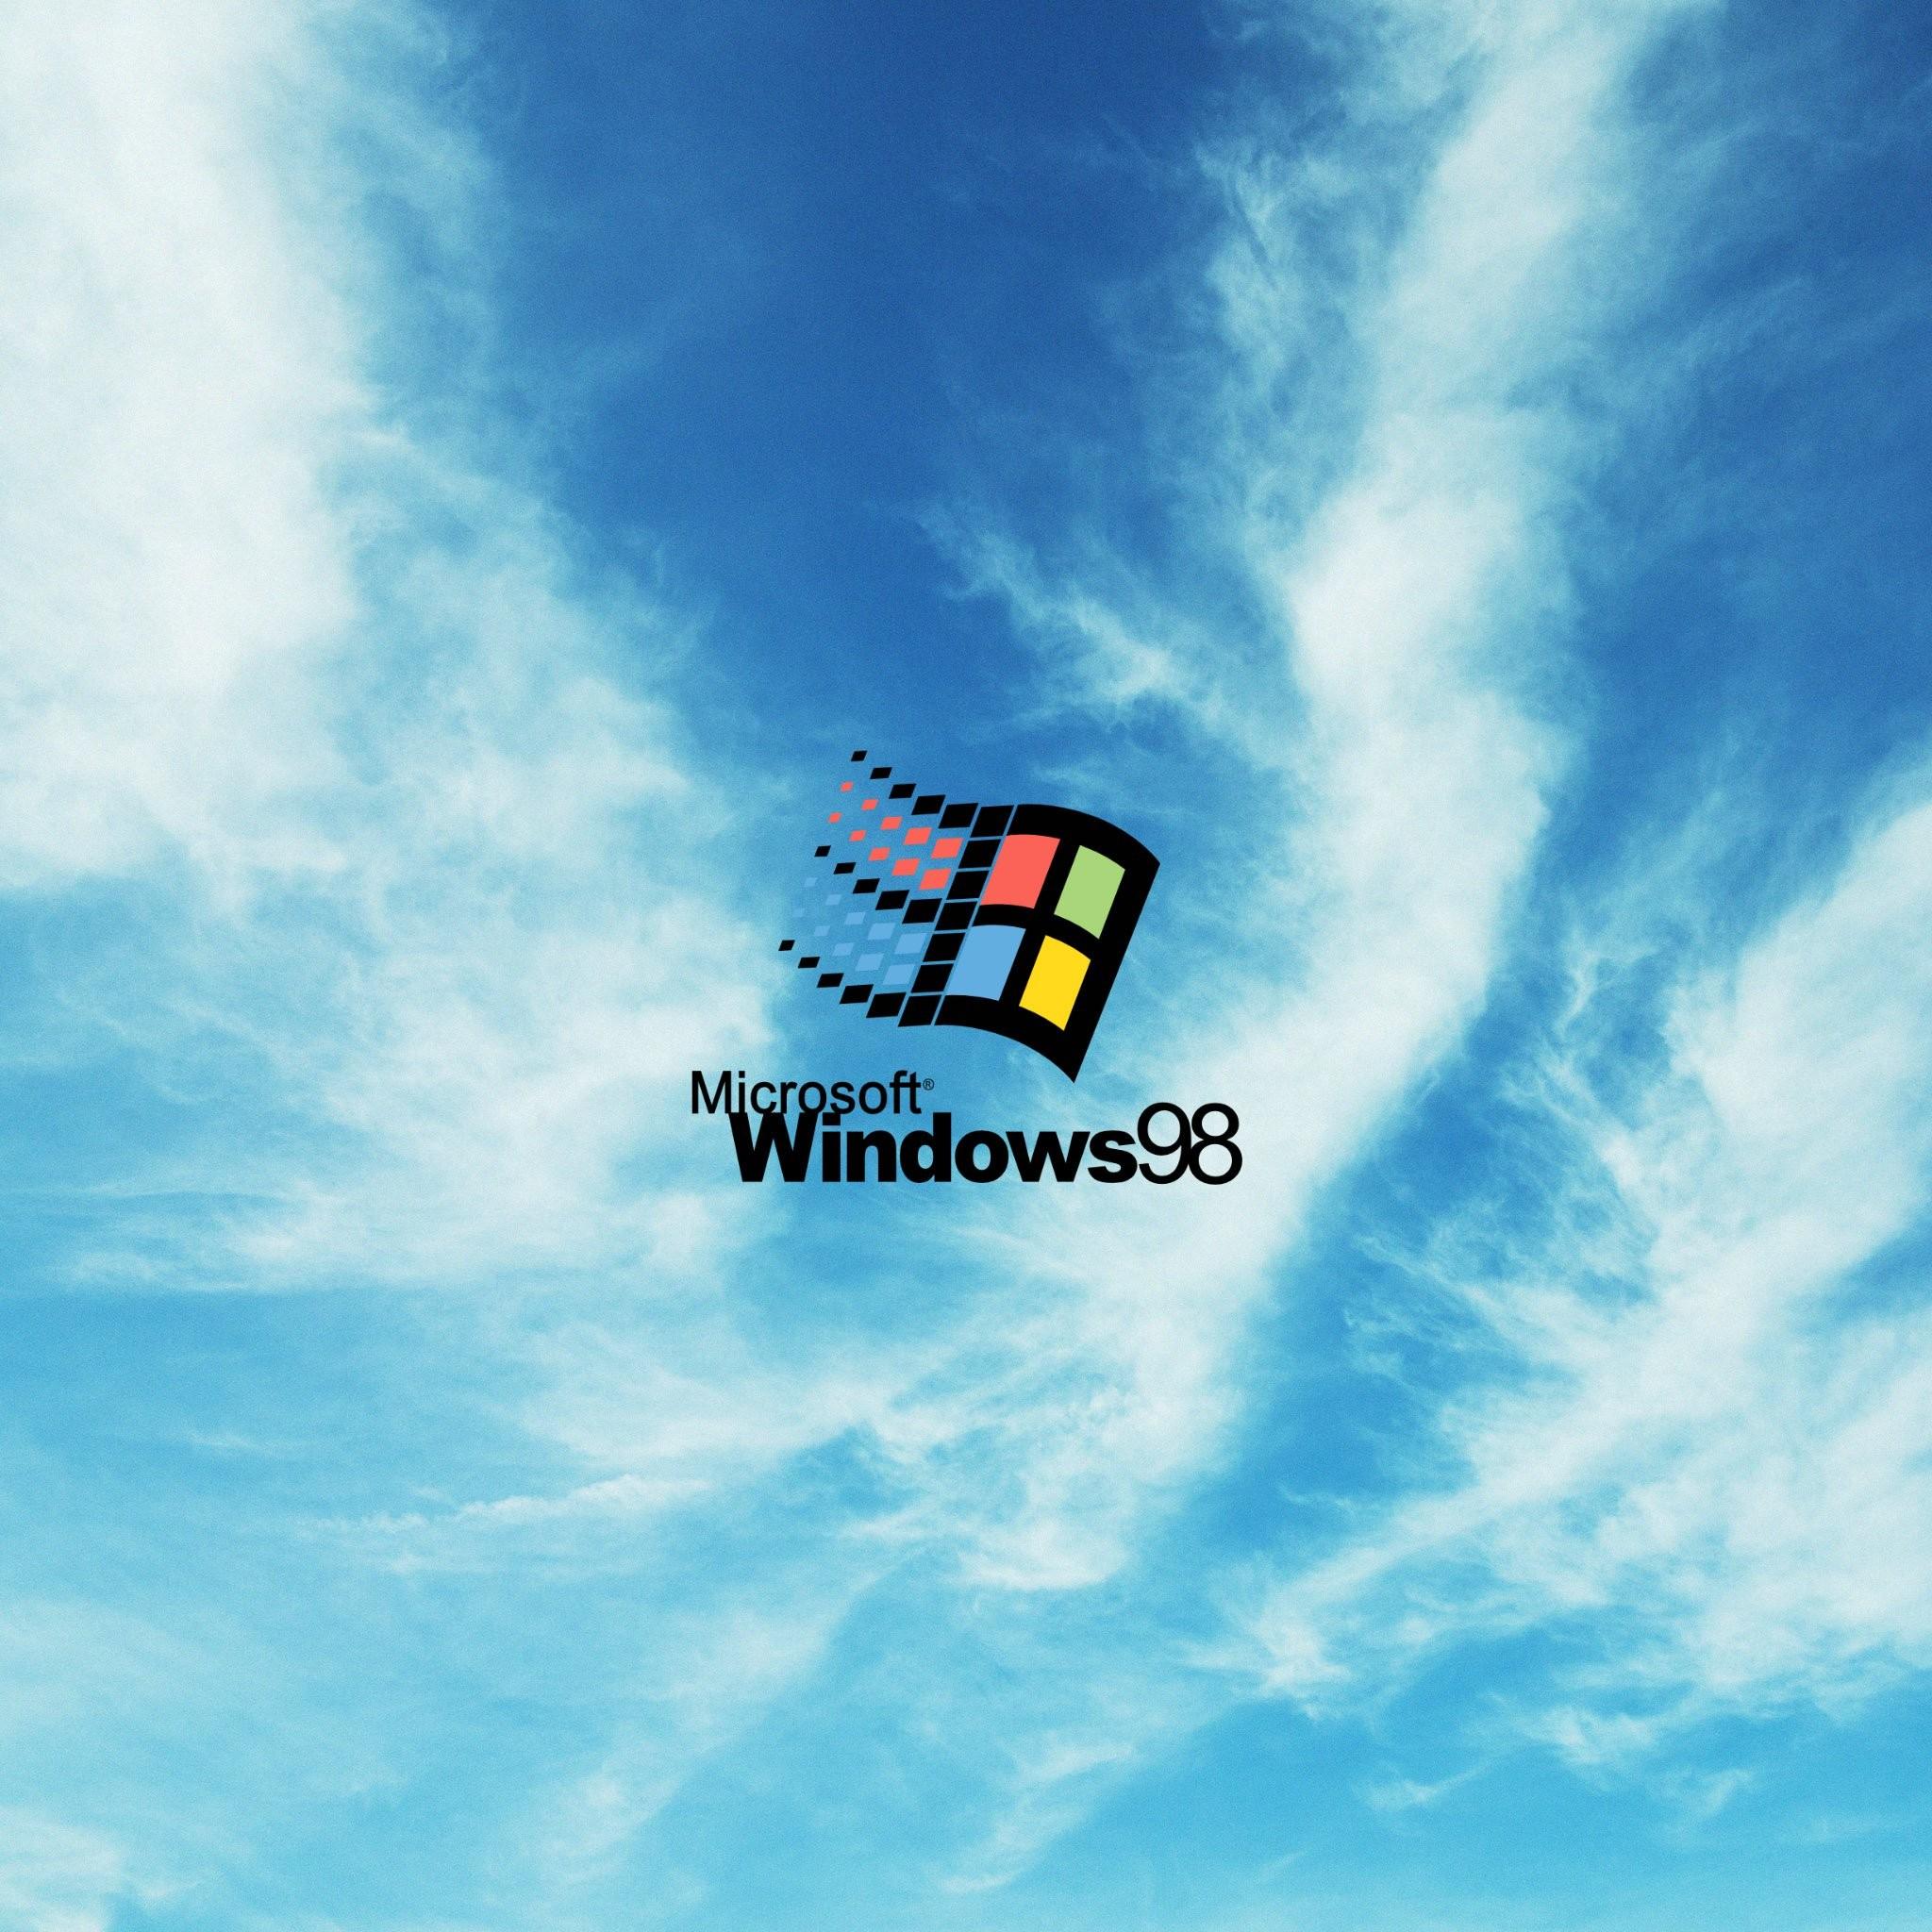 Windows 98 Wallpaper ·① Download Free Amazing HD